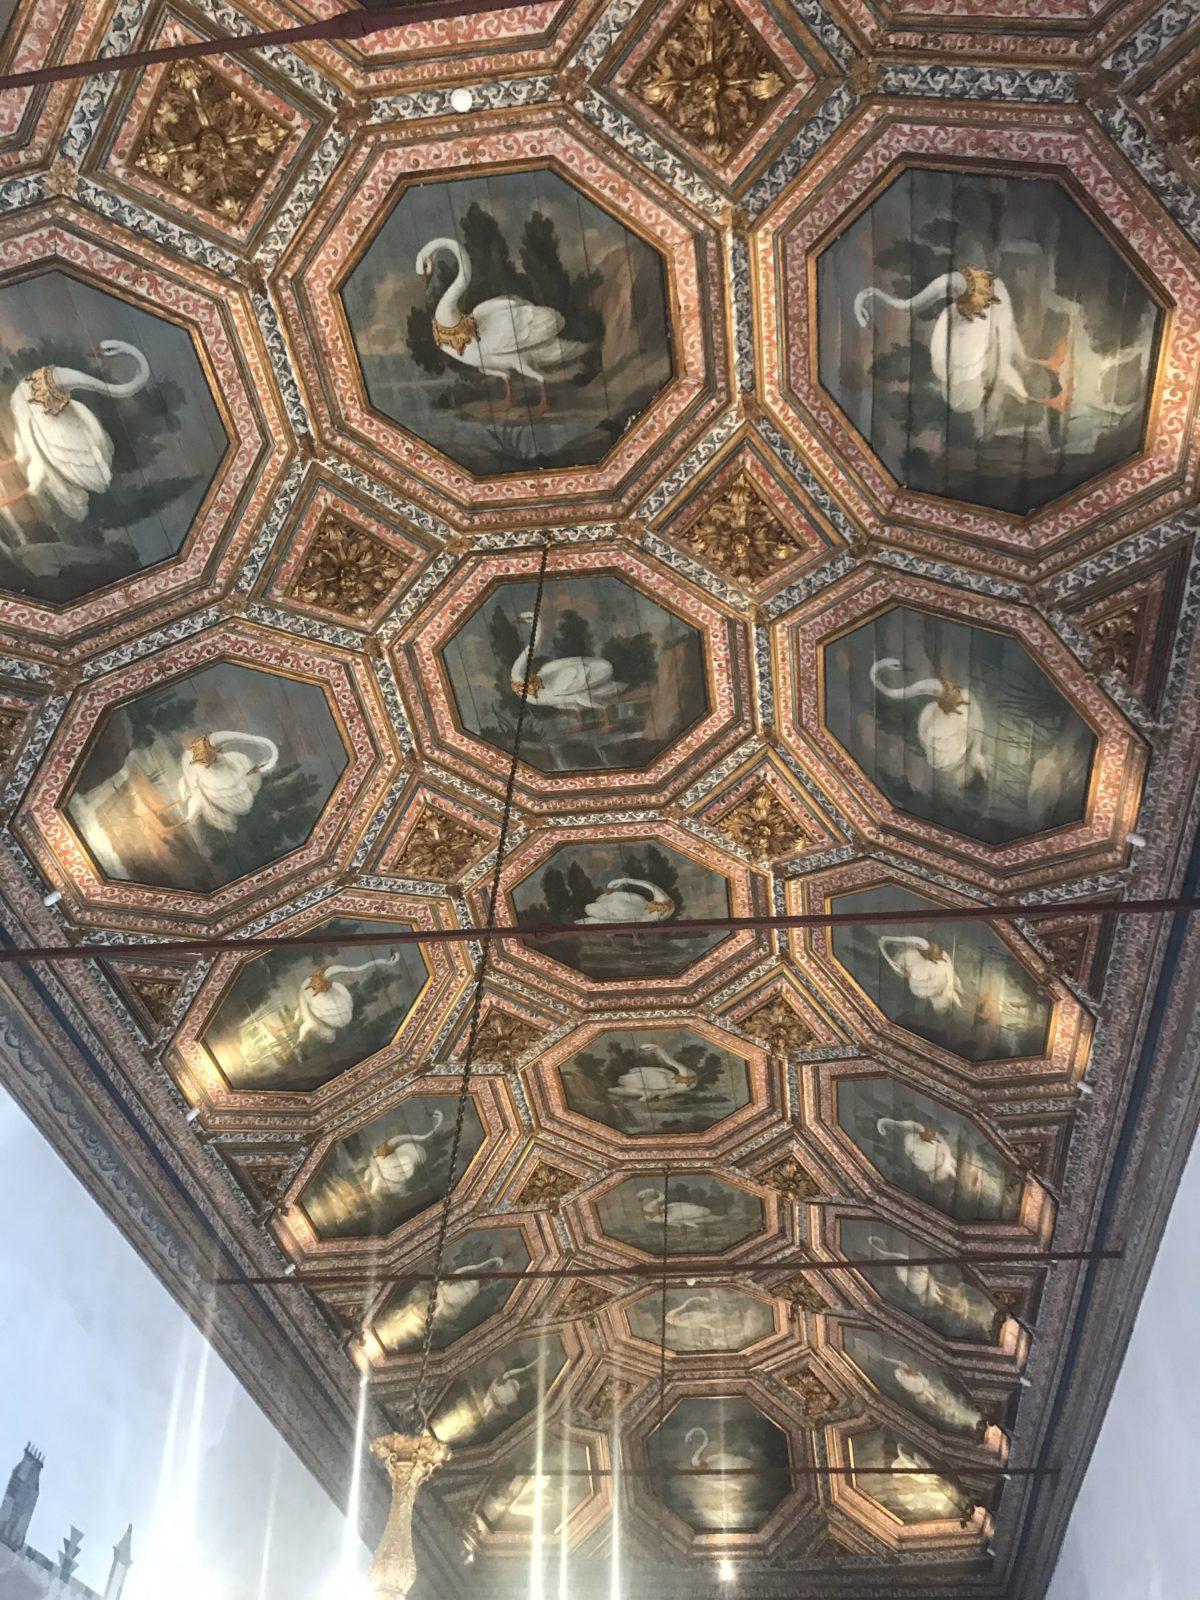 Ceiling with the Cigne colleté